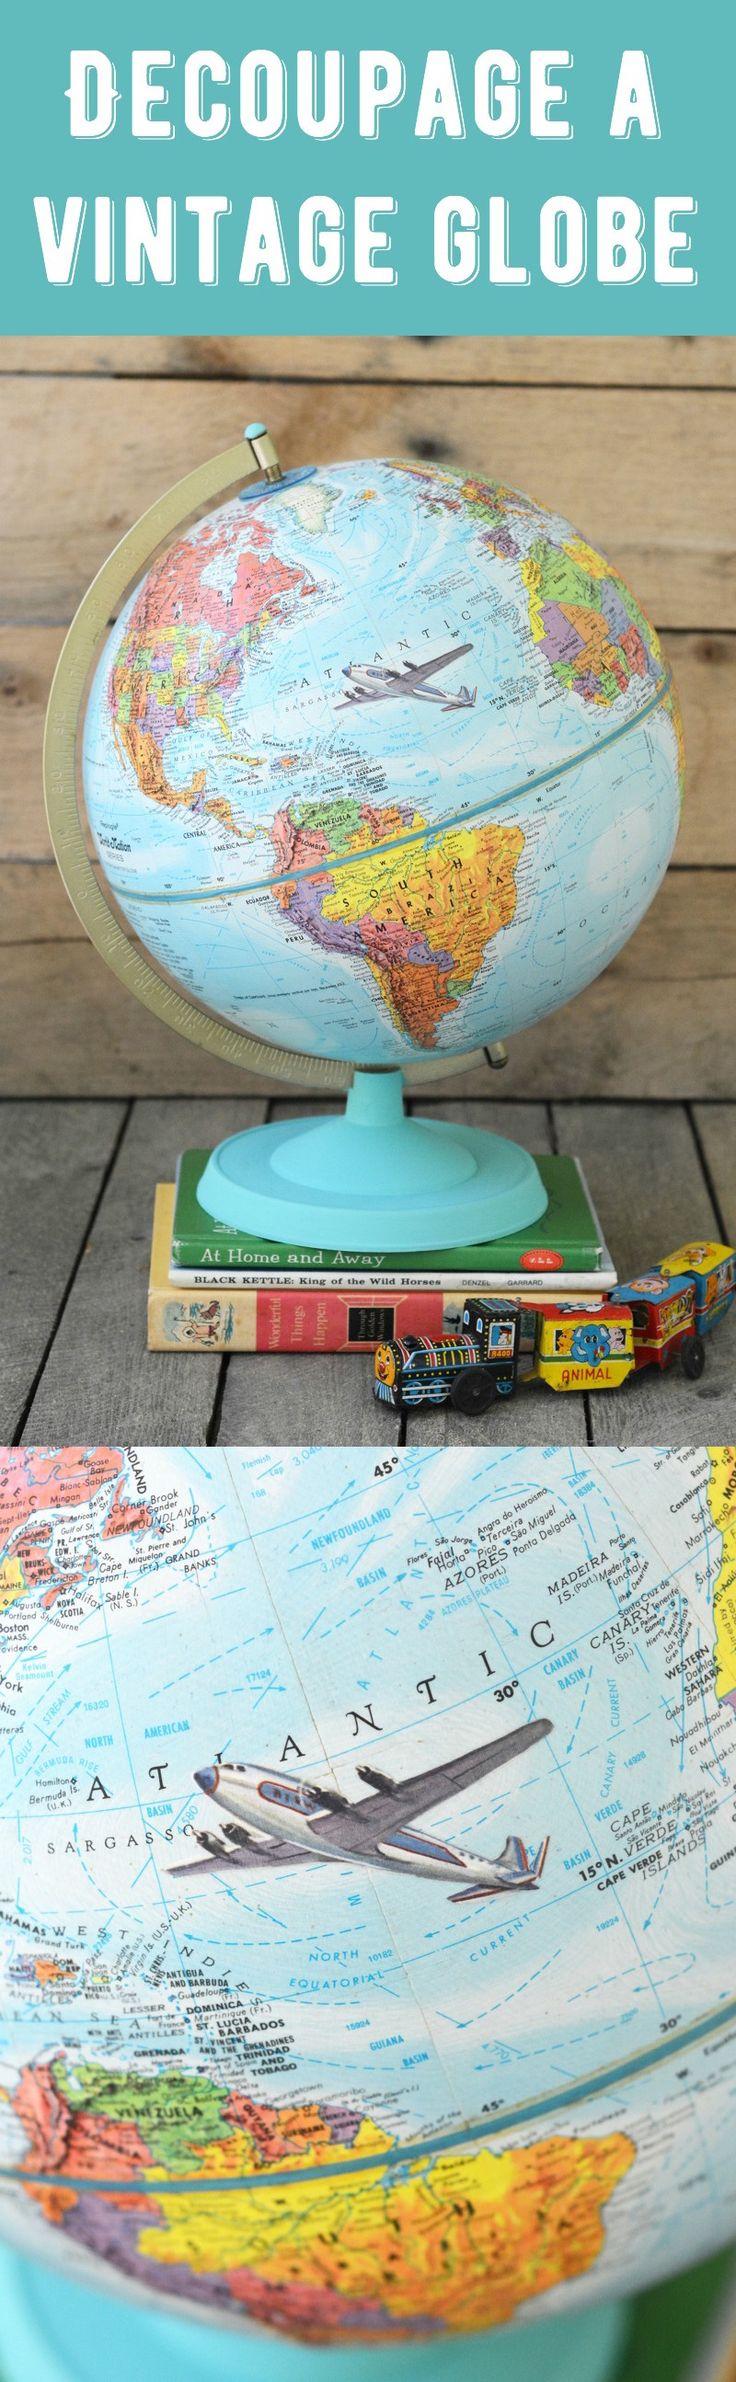 Decoupaged chalky vintage globe 209 best Map